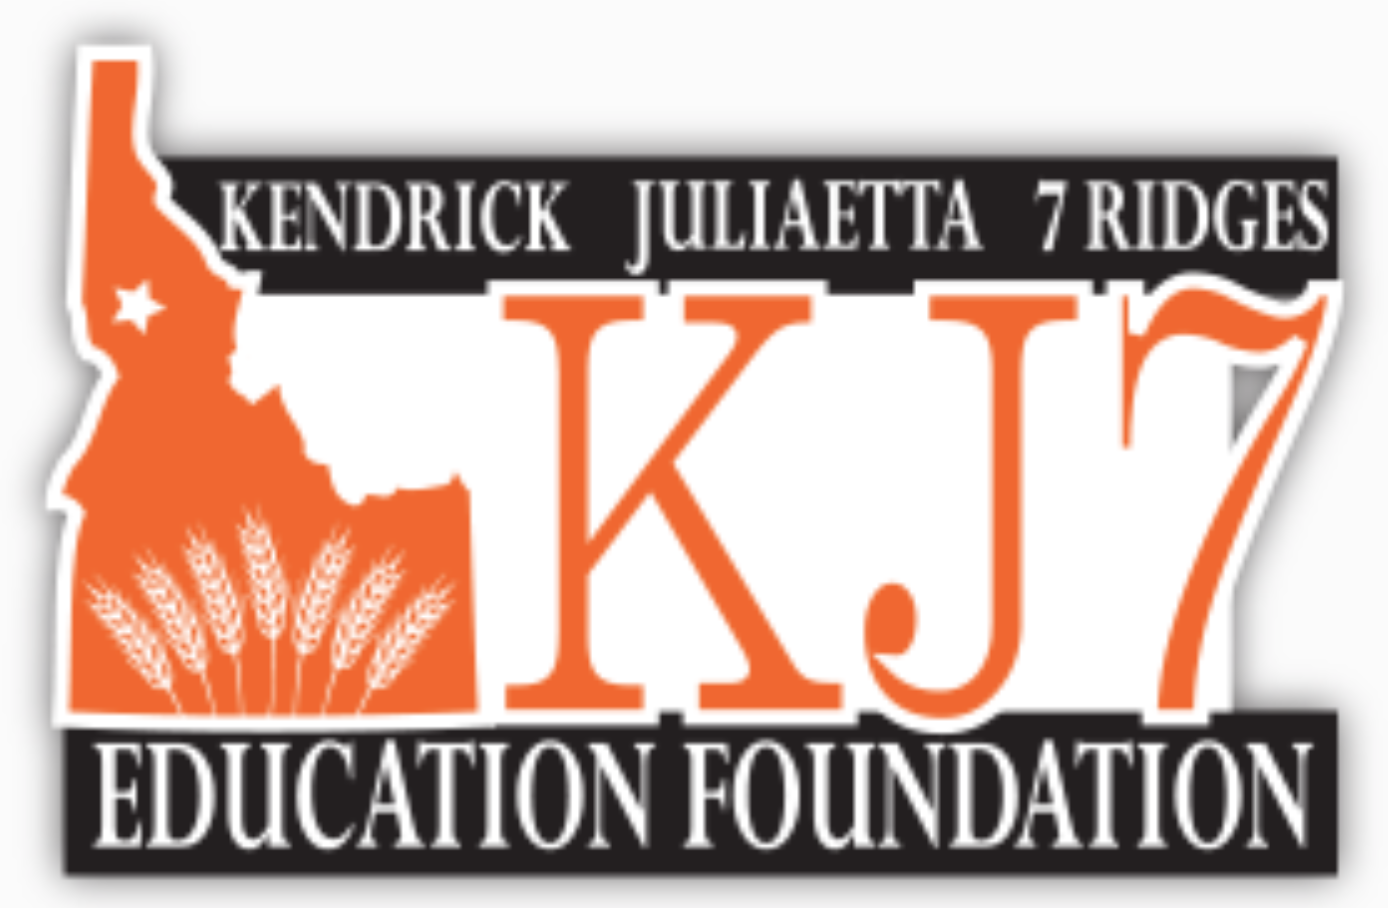 Kendrick Juliaetta & 7 Ridges Education Foundation